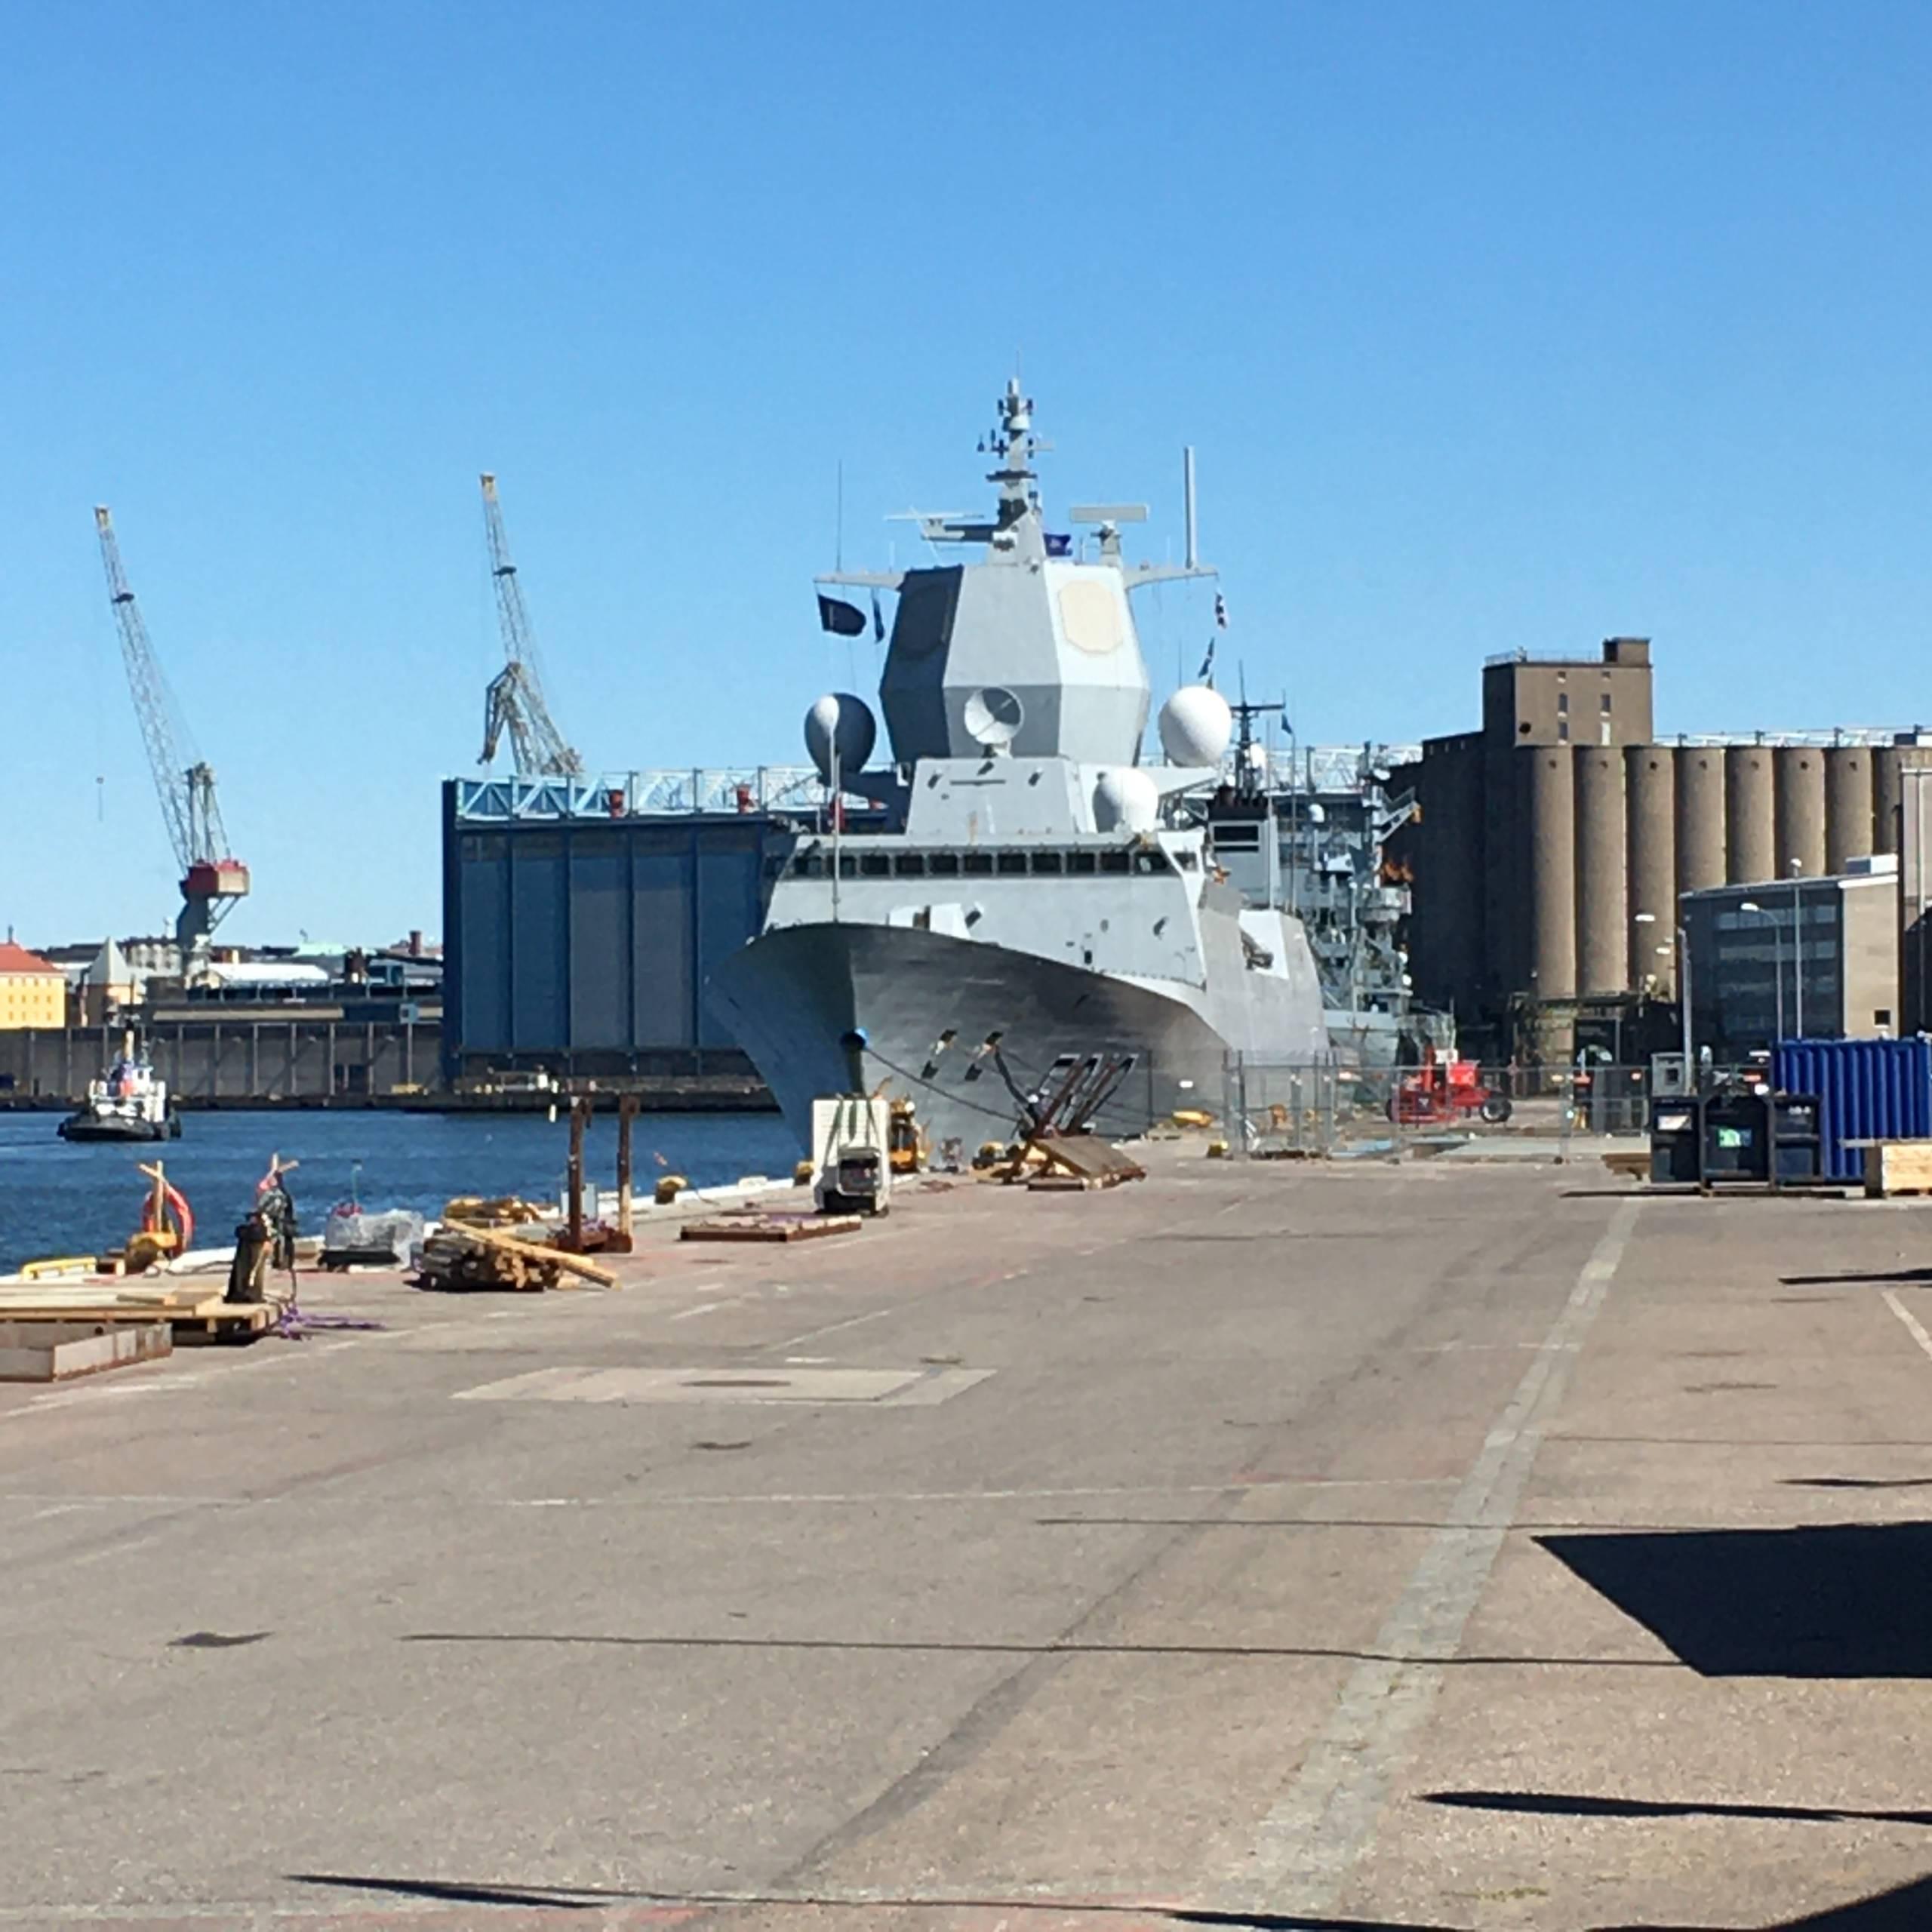 Helsinki harbour, spring 2020